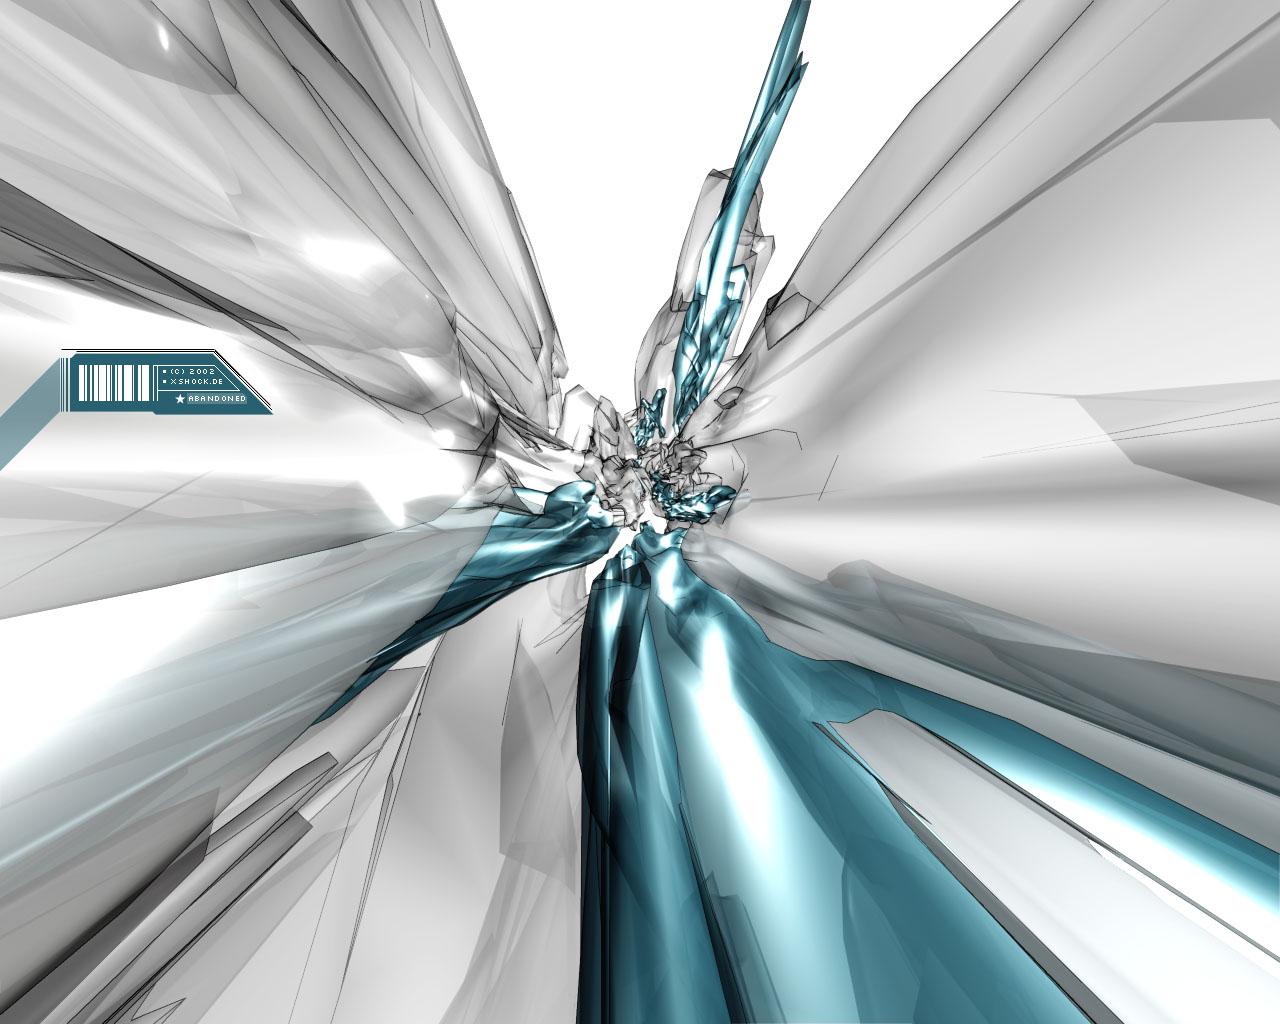 bionix wallpaper